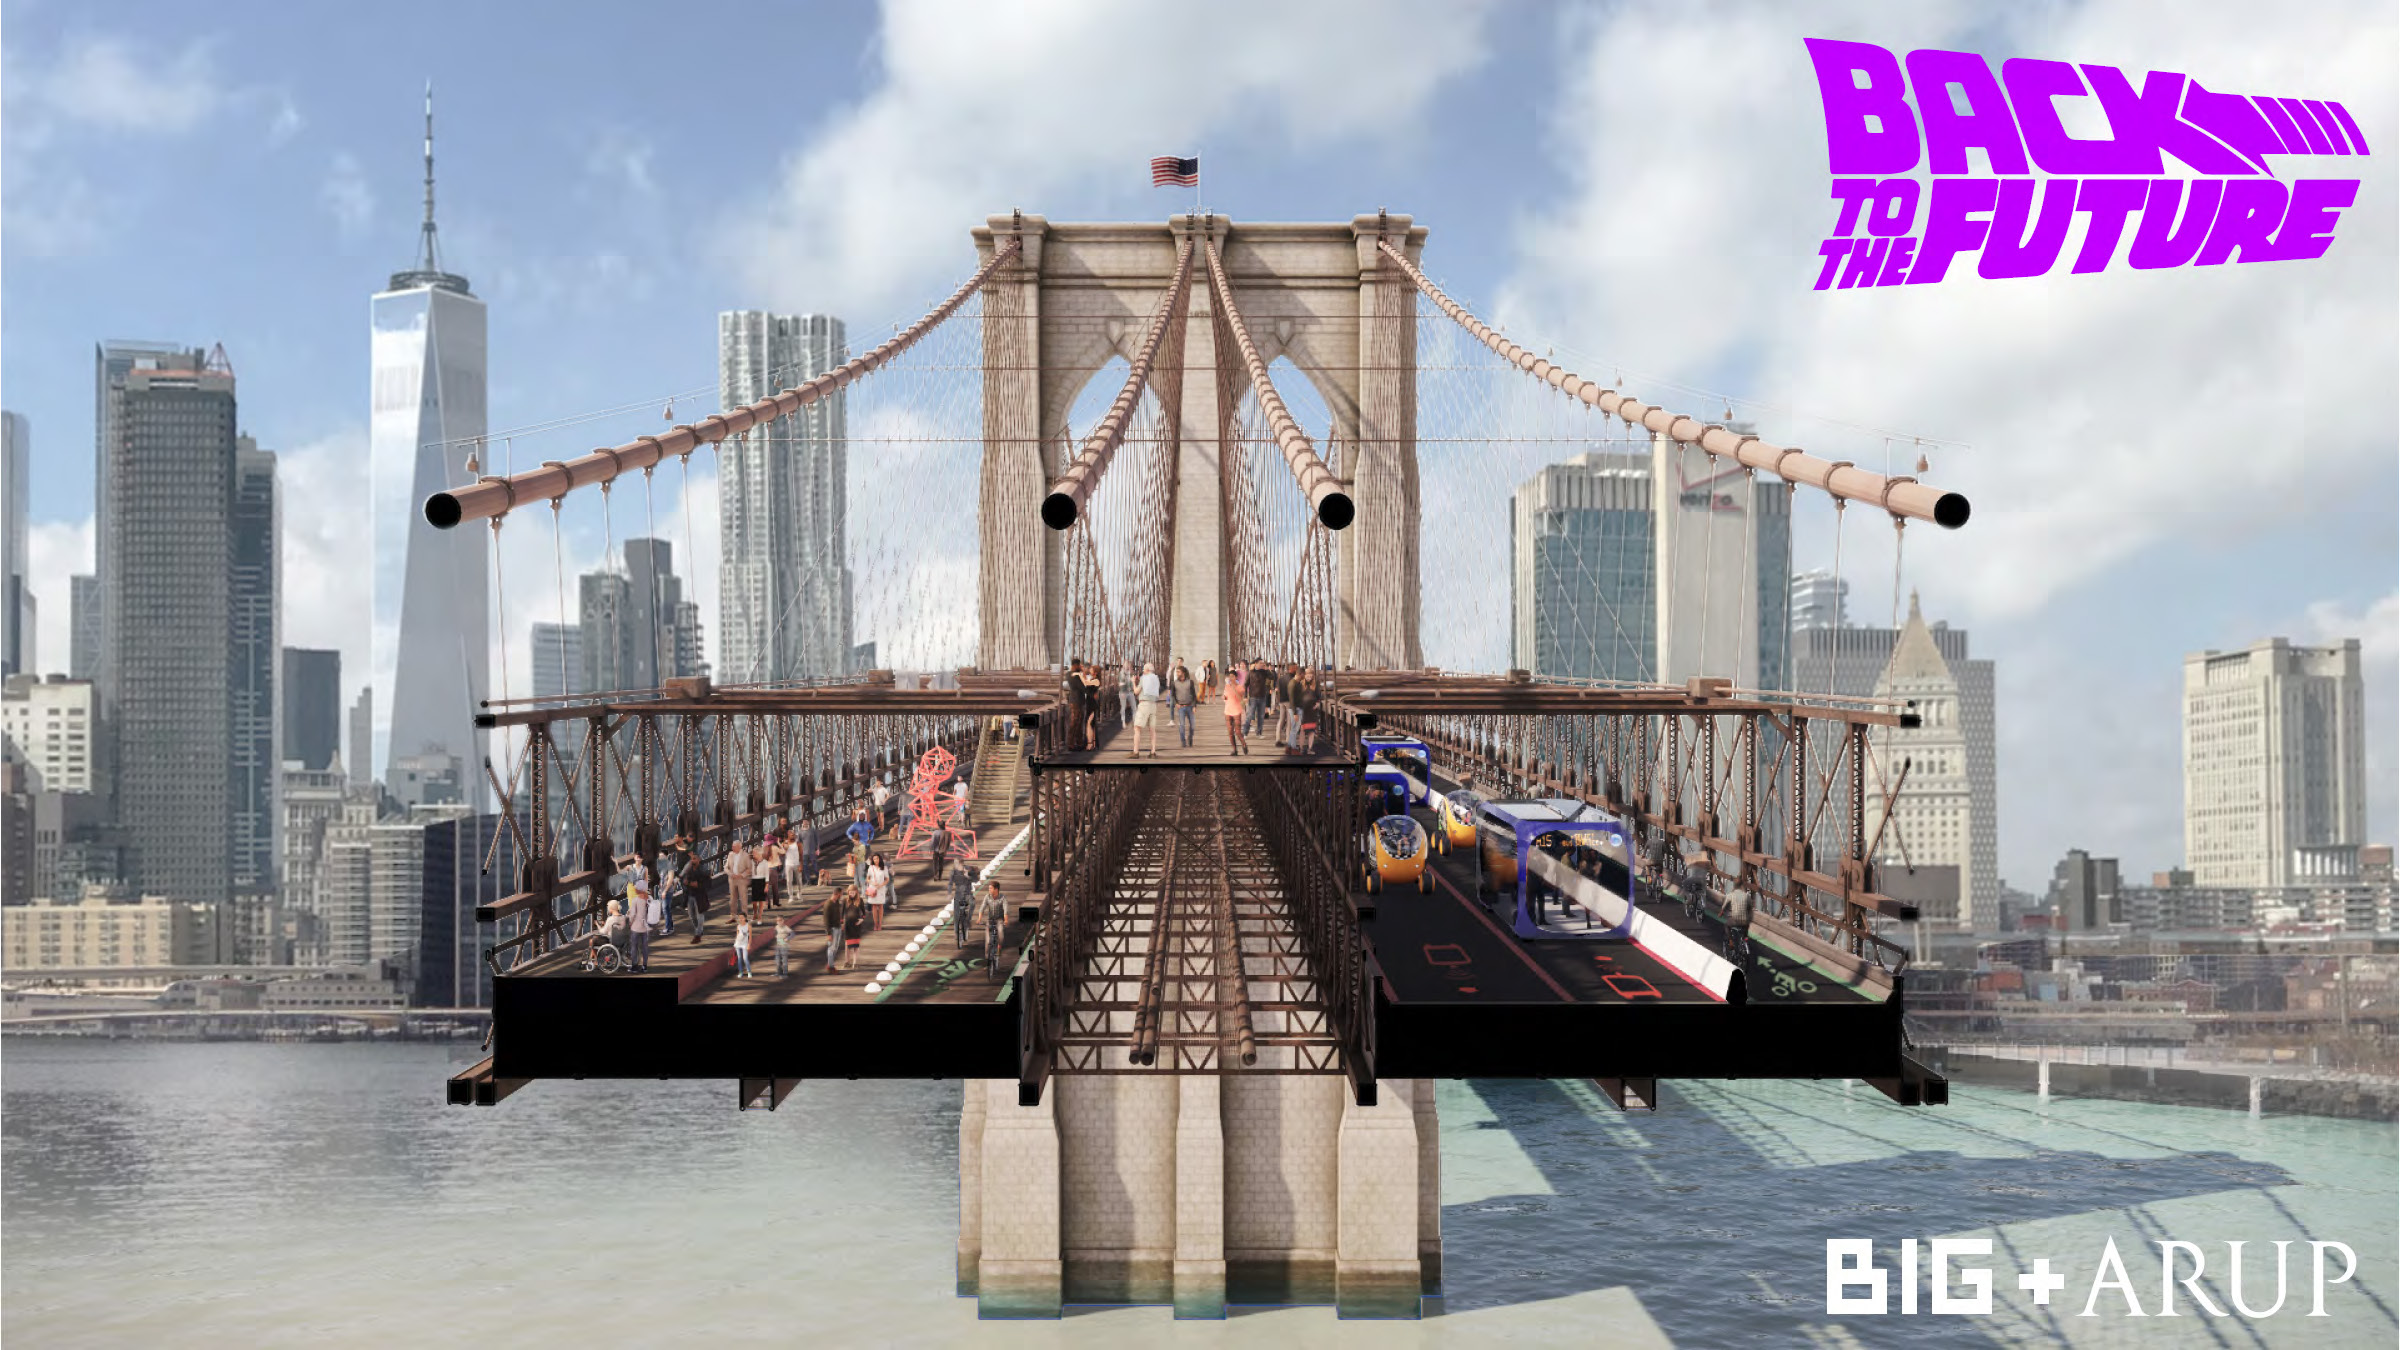 Reimagining Brooklyn Bridge: Back To The Future